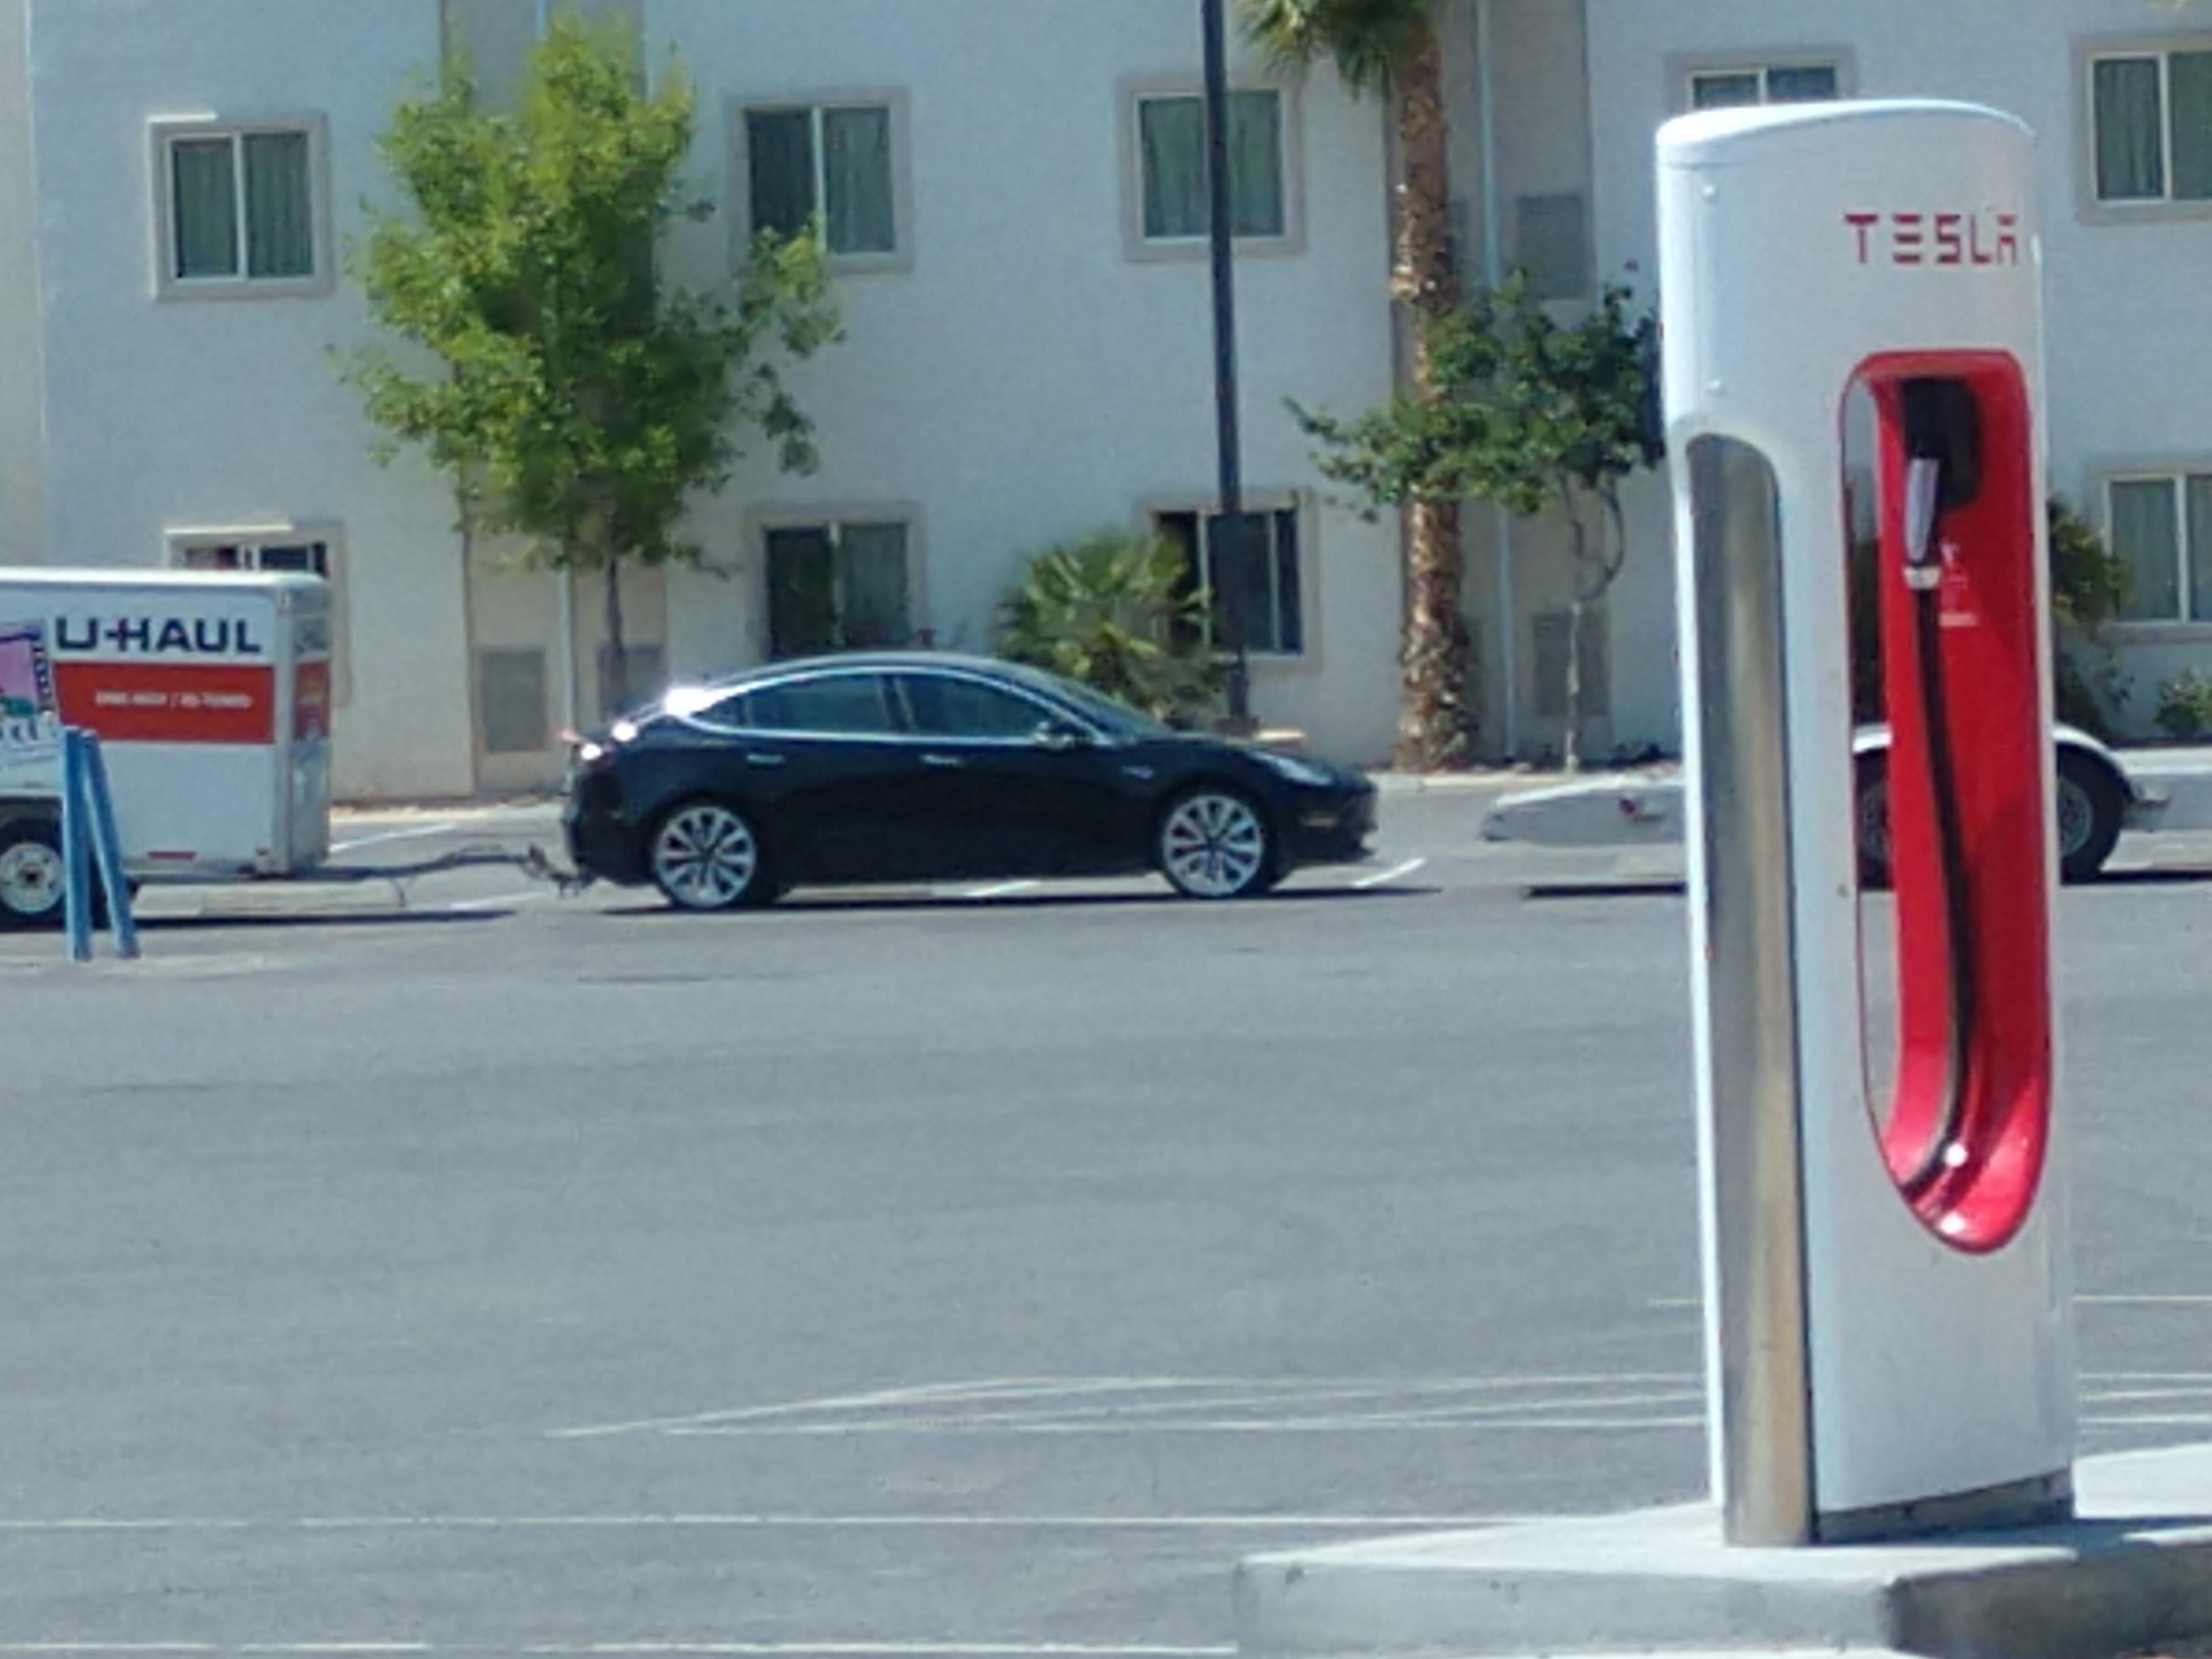 Tesla Model 3 spotted testing towing capacity - Electrek on u-haul trailer wiring kit, toyota wiring harness, u-haul trailer light harness, u-haul wiring adapter, camper wiring harness, diesel wiring harness, u-haul wiring harness diagram,